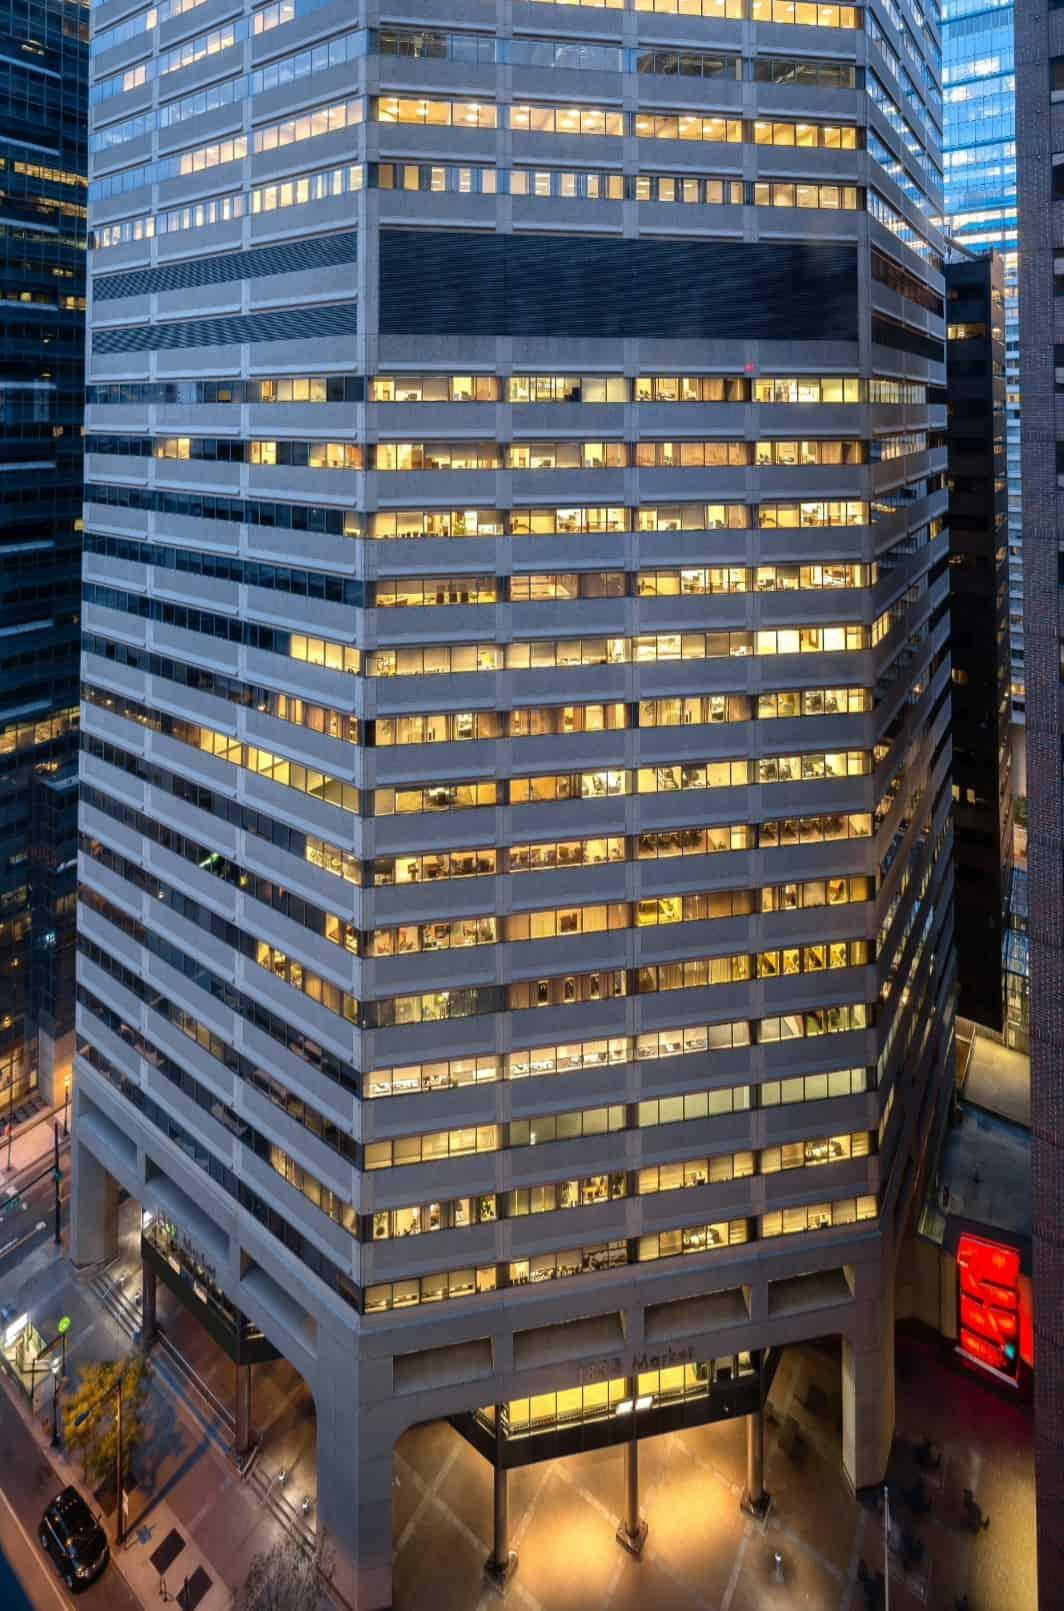 Commercial Real Estate Photo for Design Awards